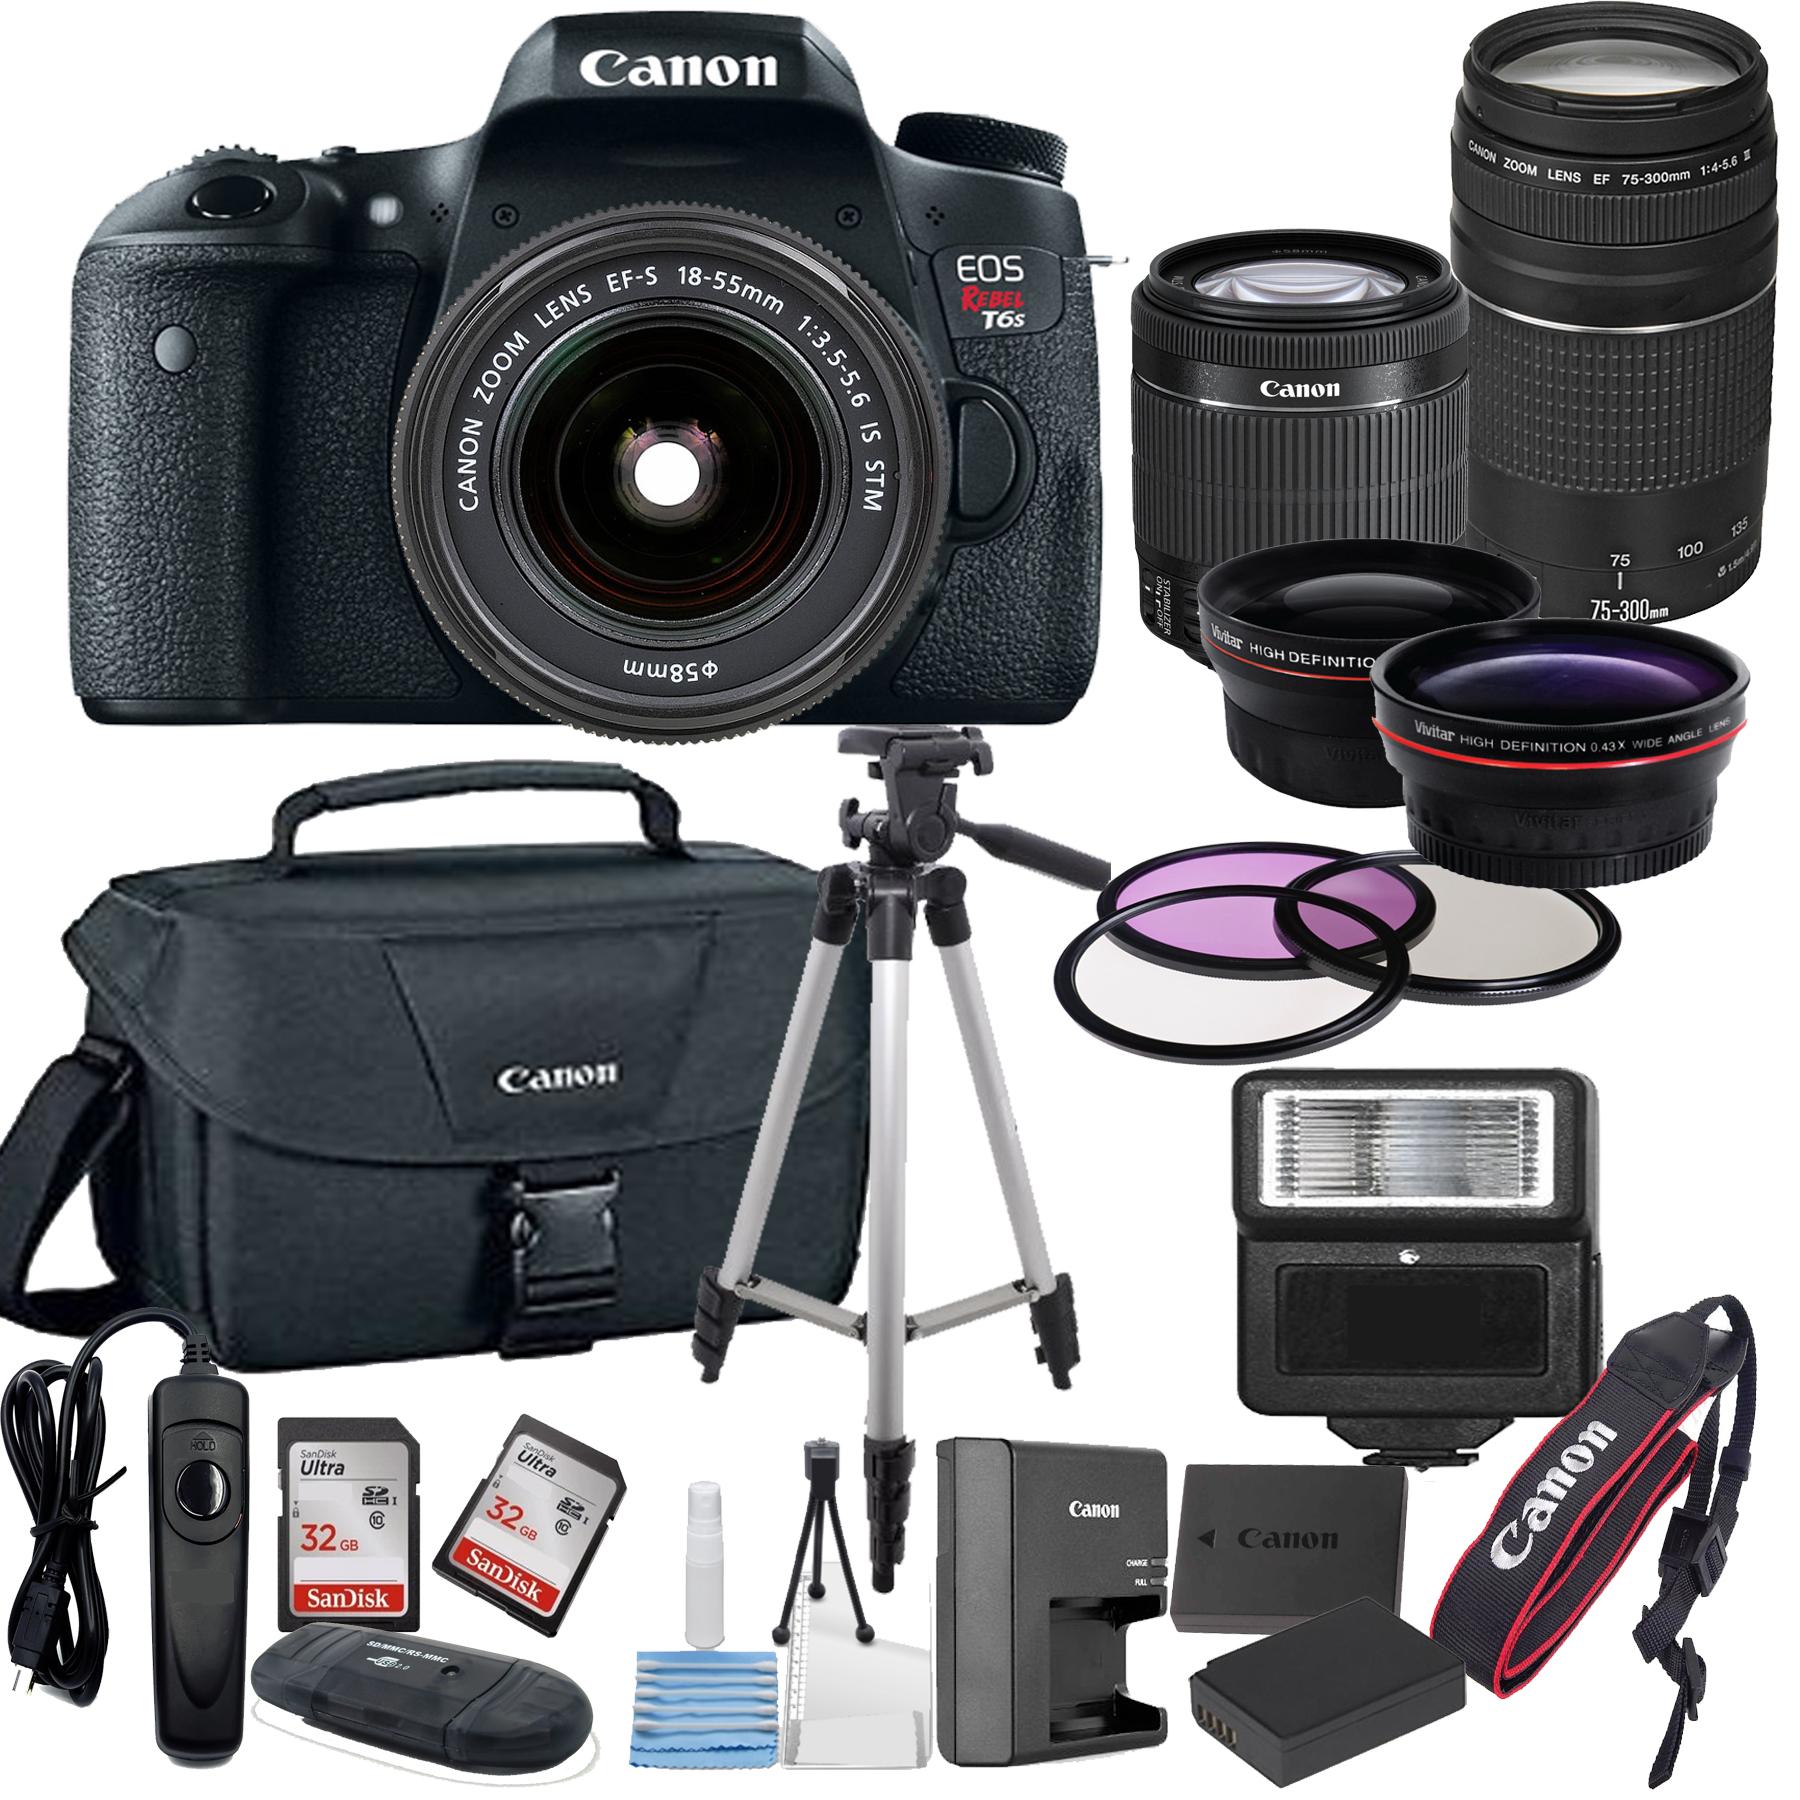 Canon EOS Rebel T6S Digital SLR Camera w/ EF-S 18-55mm + 75